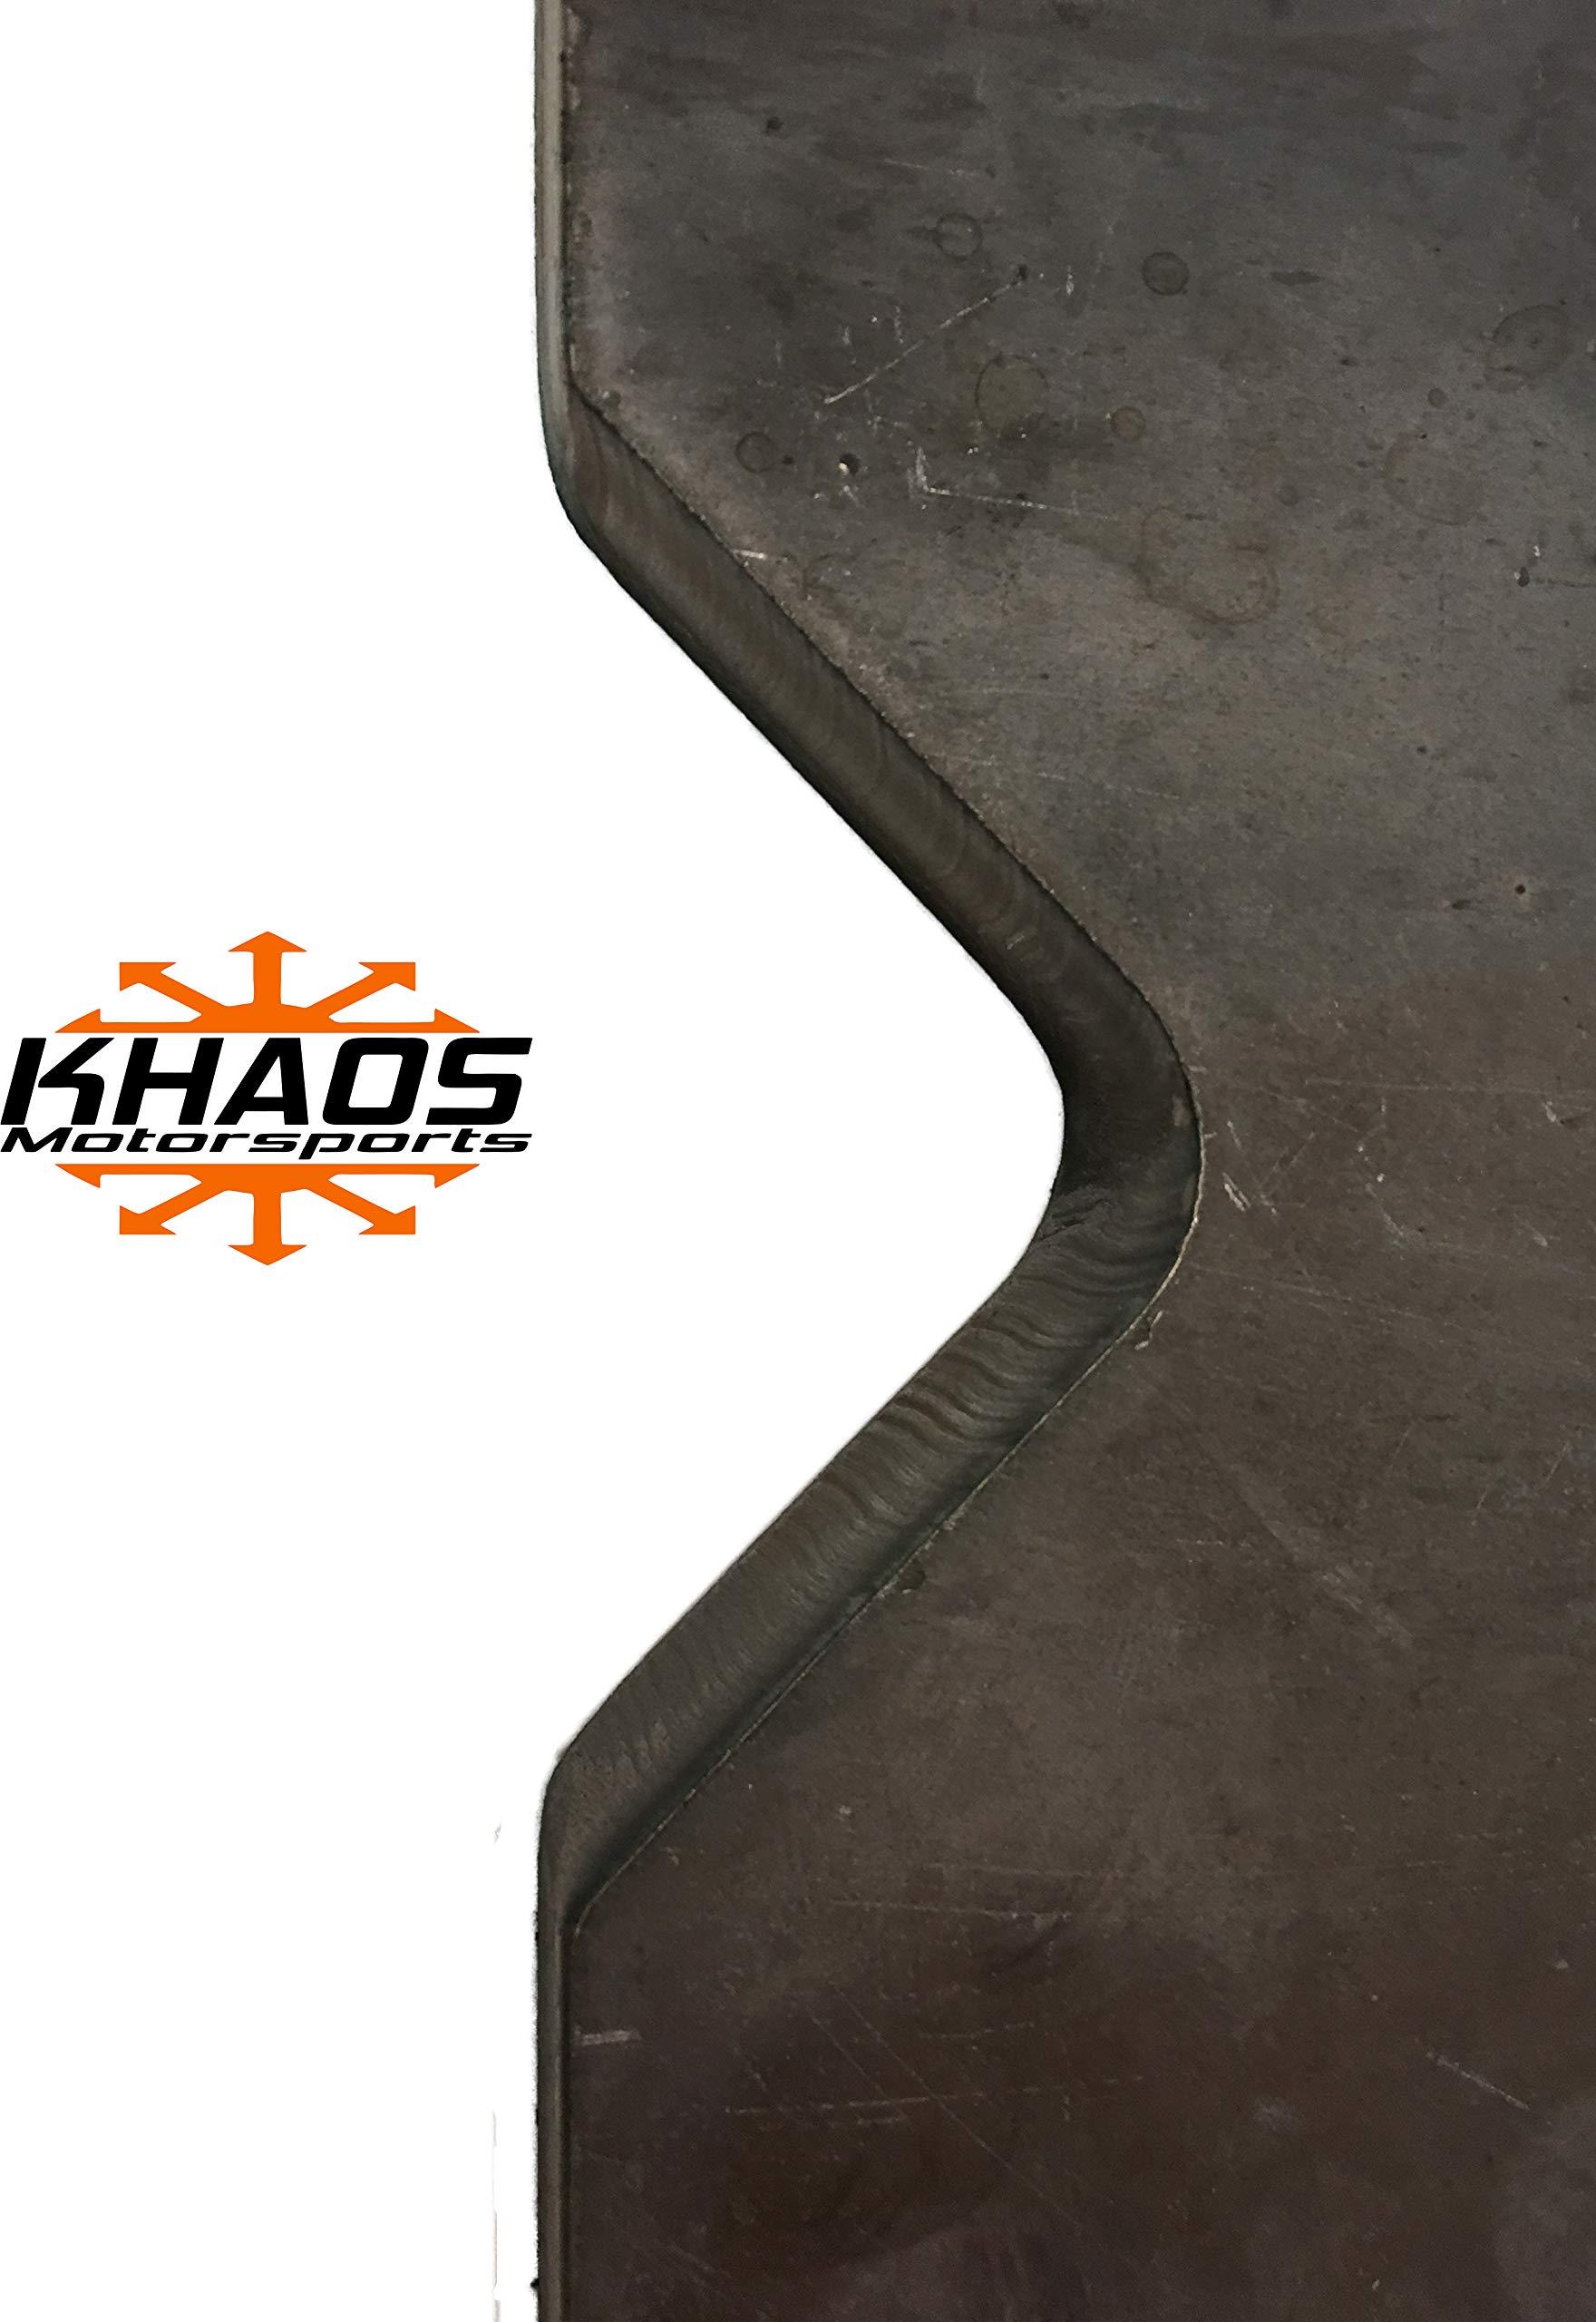 PRESS PLATES ARBOR PARALLELS 1''X8''X8'' SET by Khaos Motorsports (Image #6)